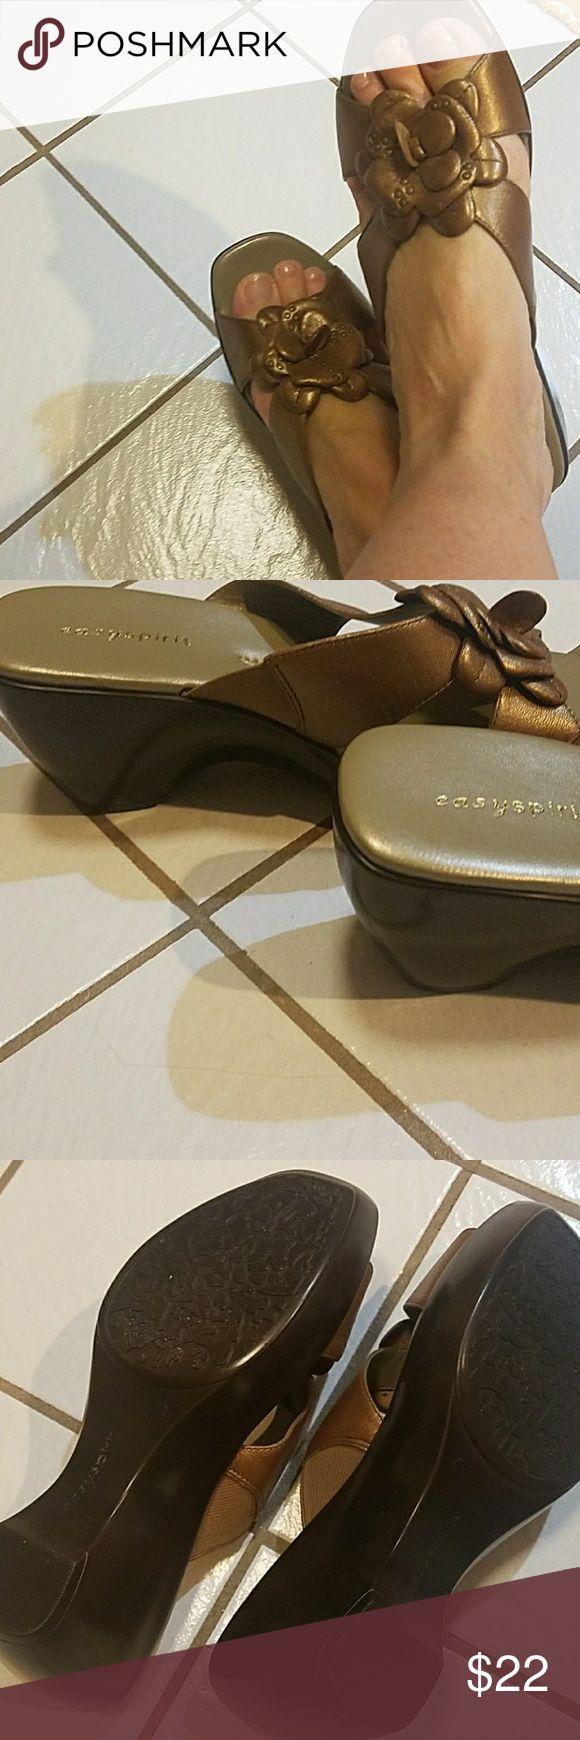 Easy spirit sandals Cute comfortable gold sandals. Brand new Easy Spirit Shoes Sandals